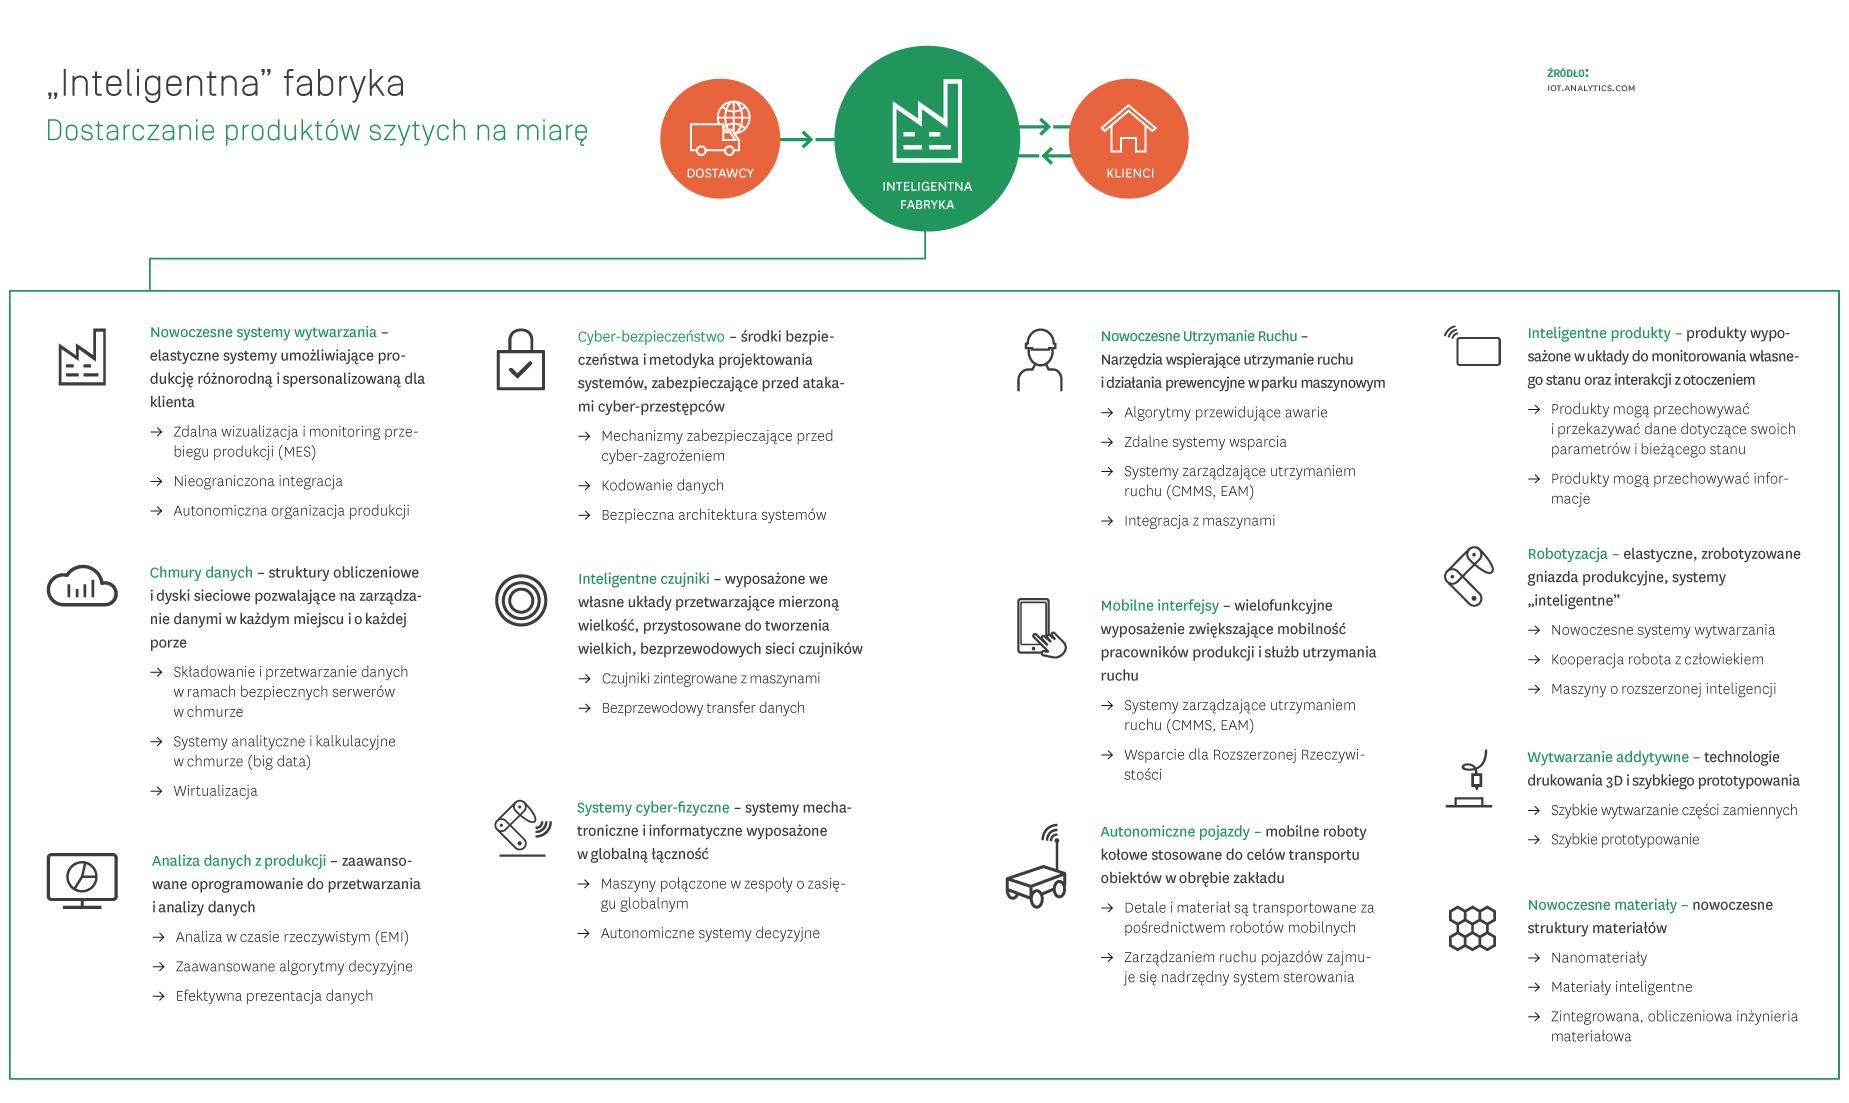 Inteligentne_fabryki_infografika